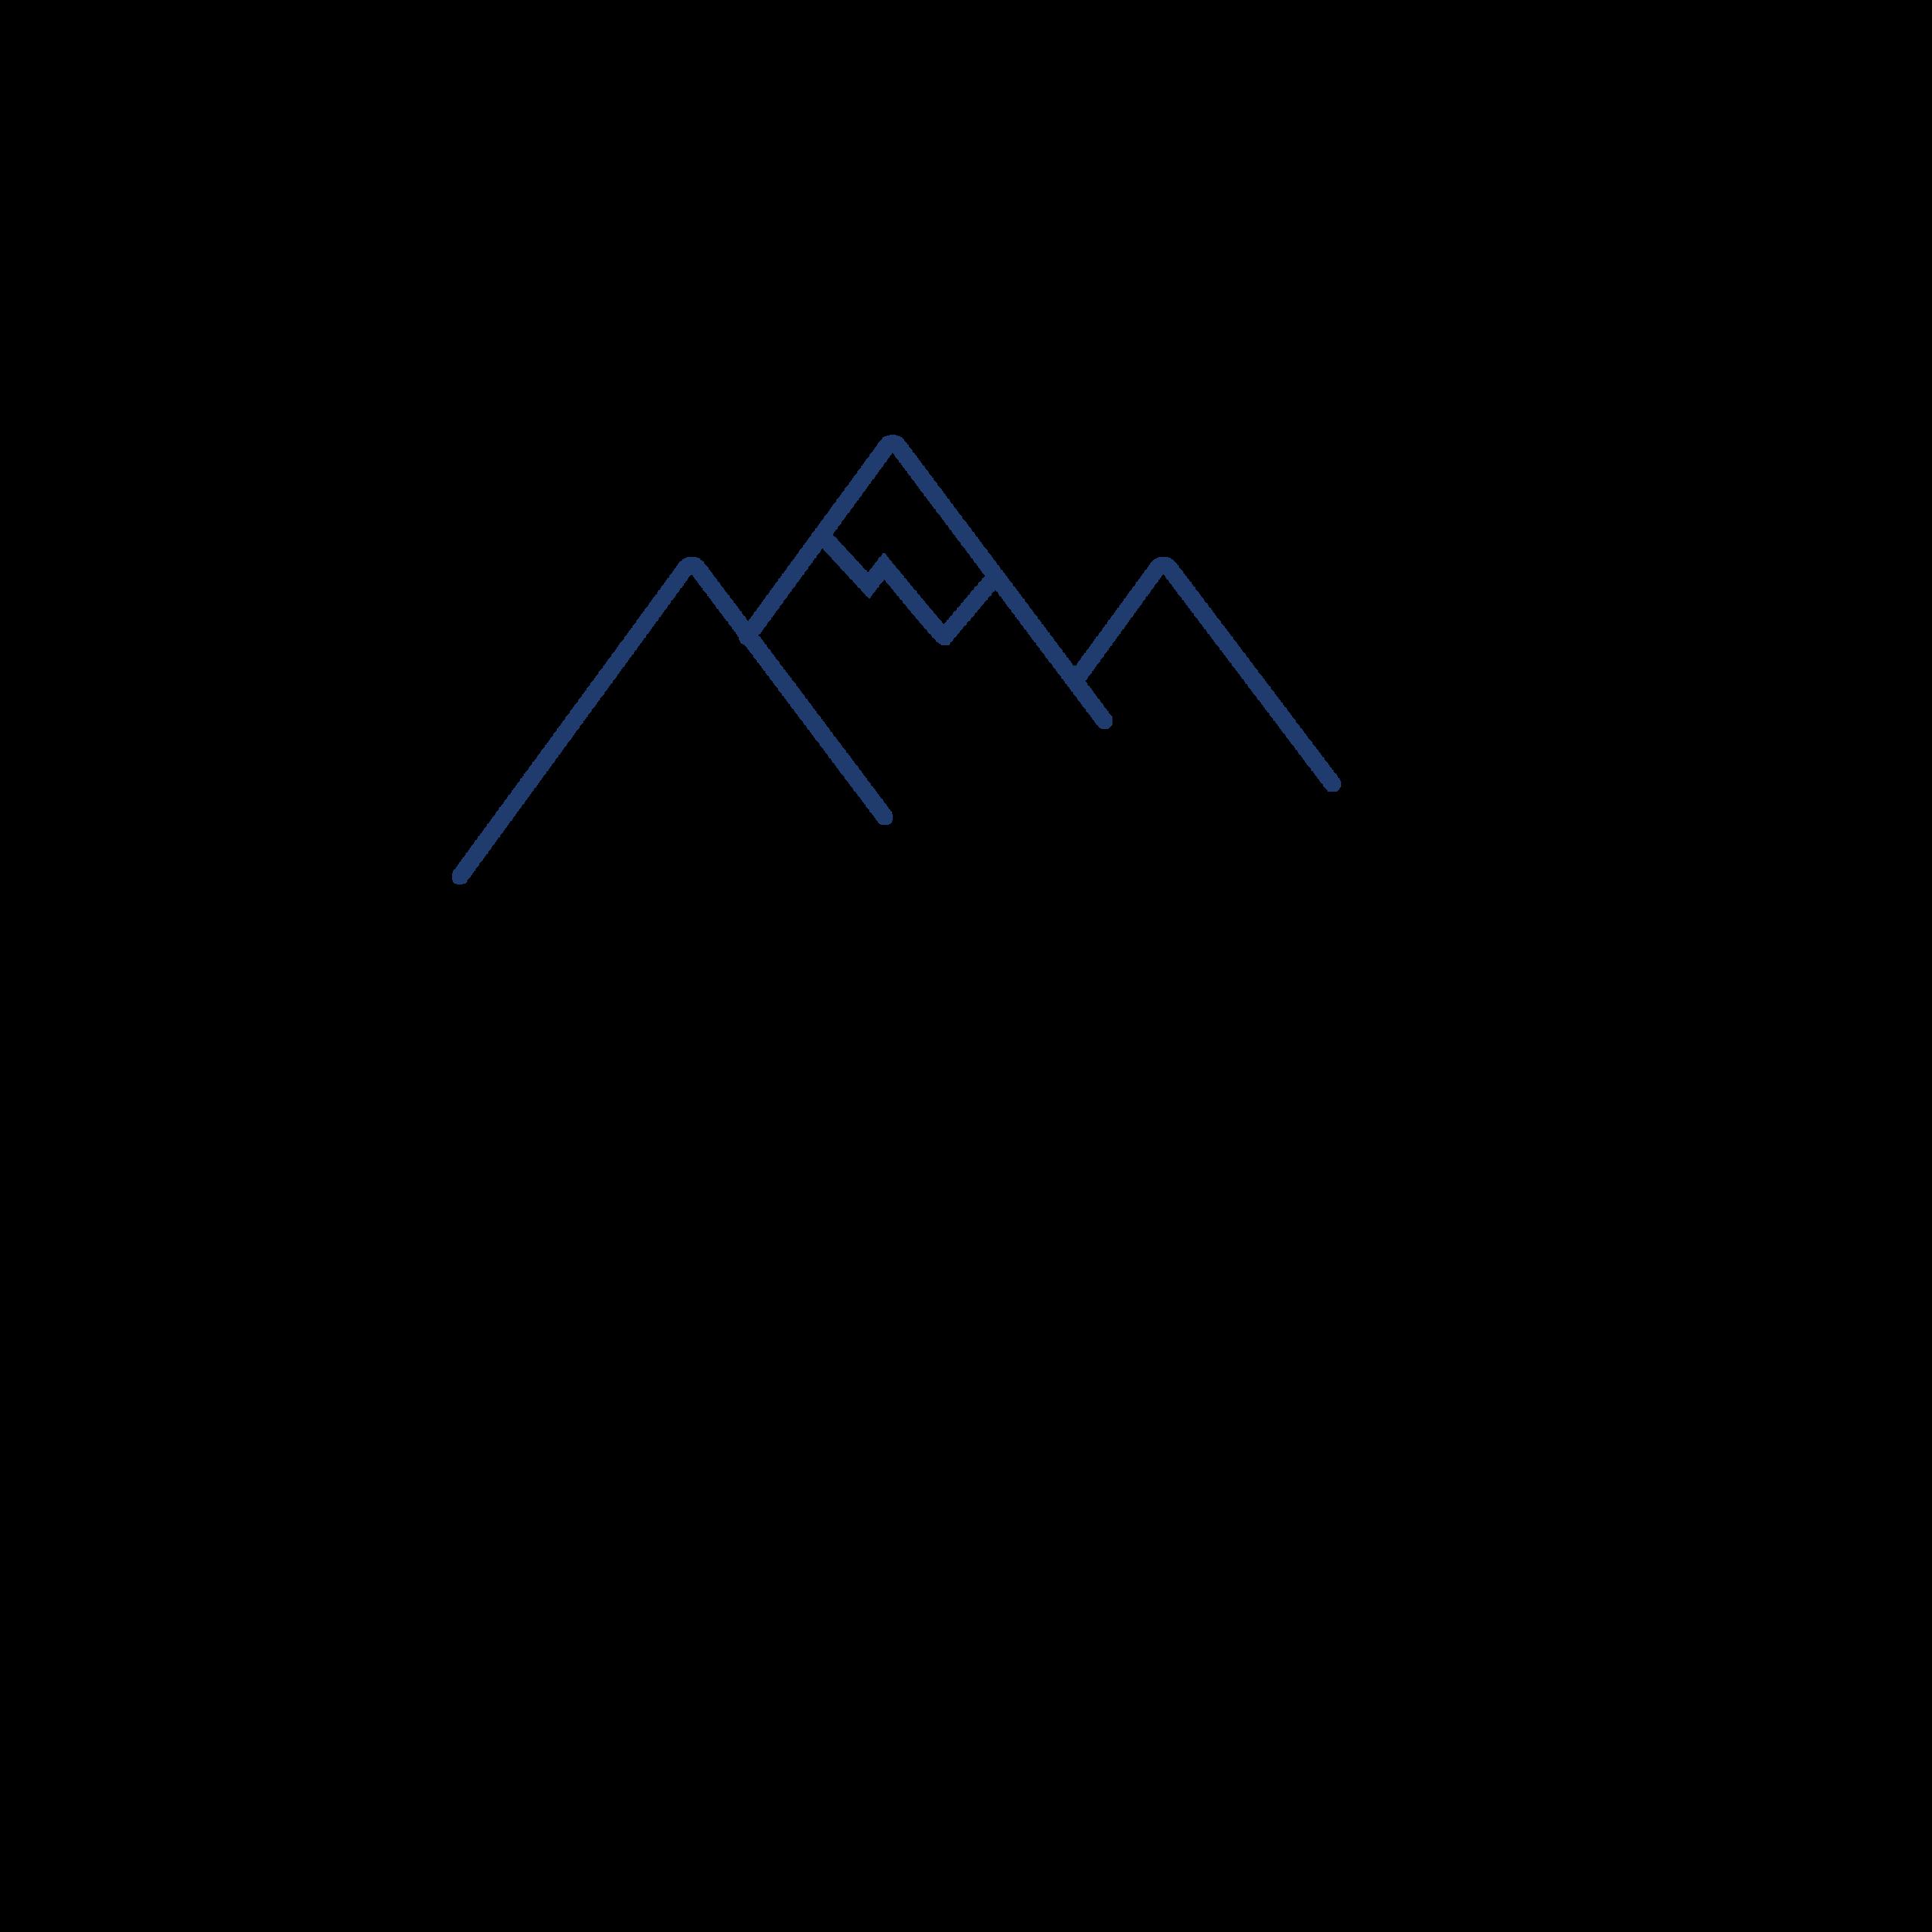 logo Stations Nice côte d'Azur-01